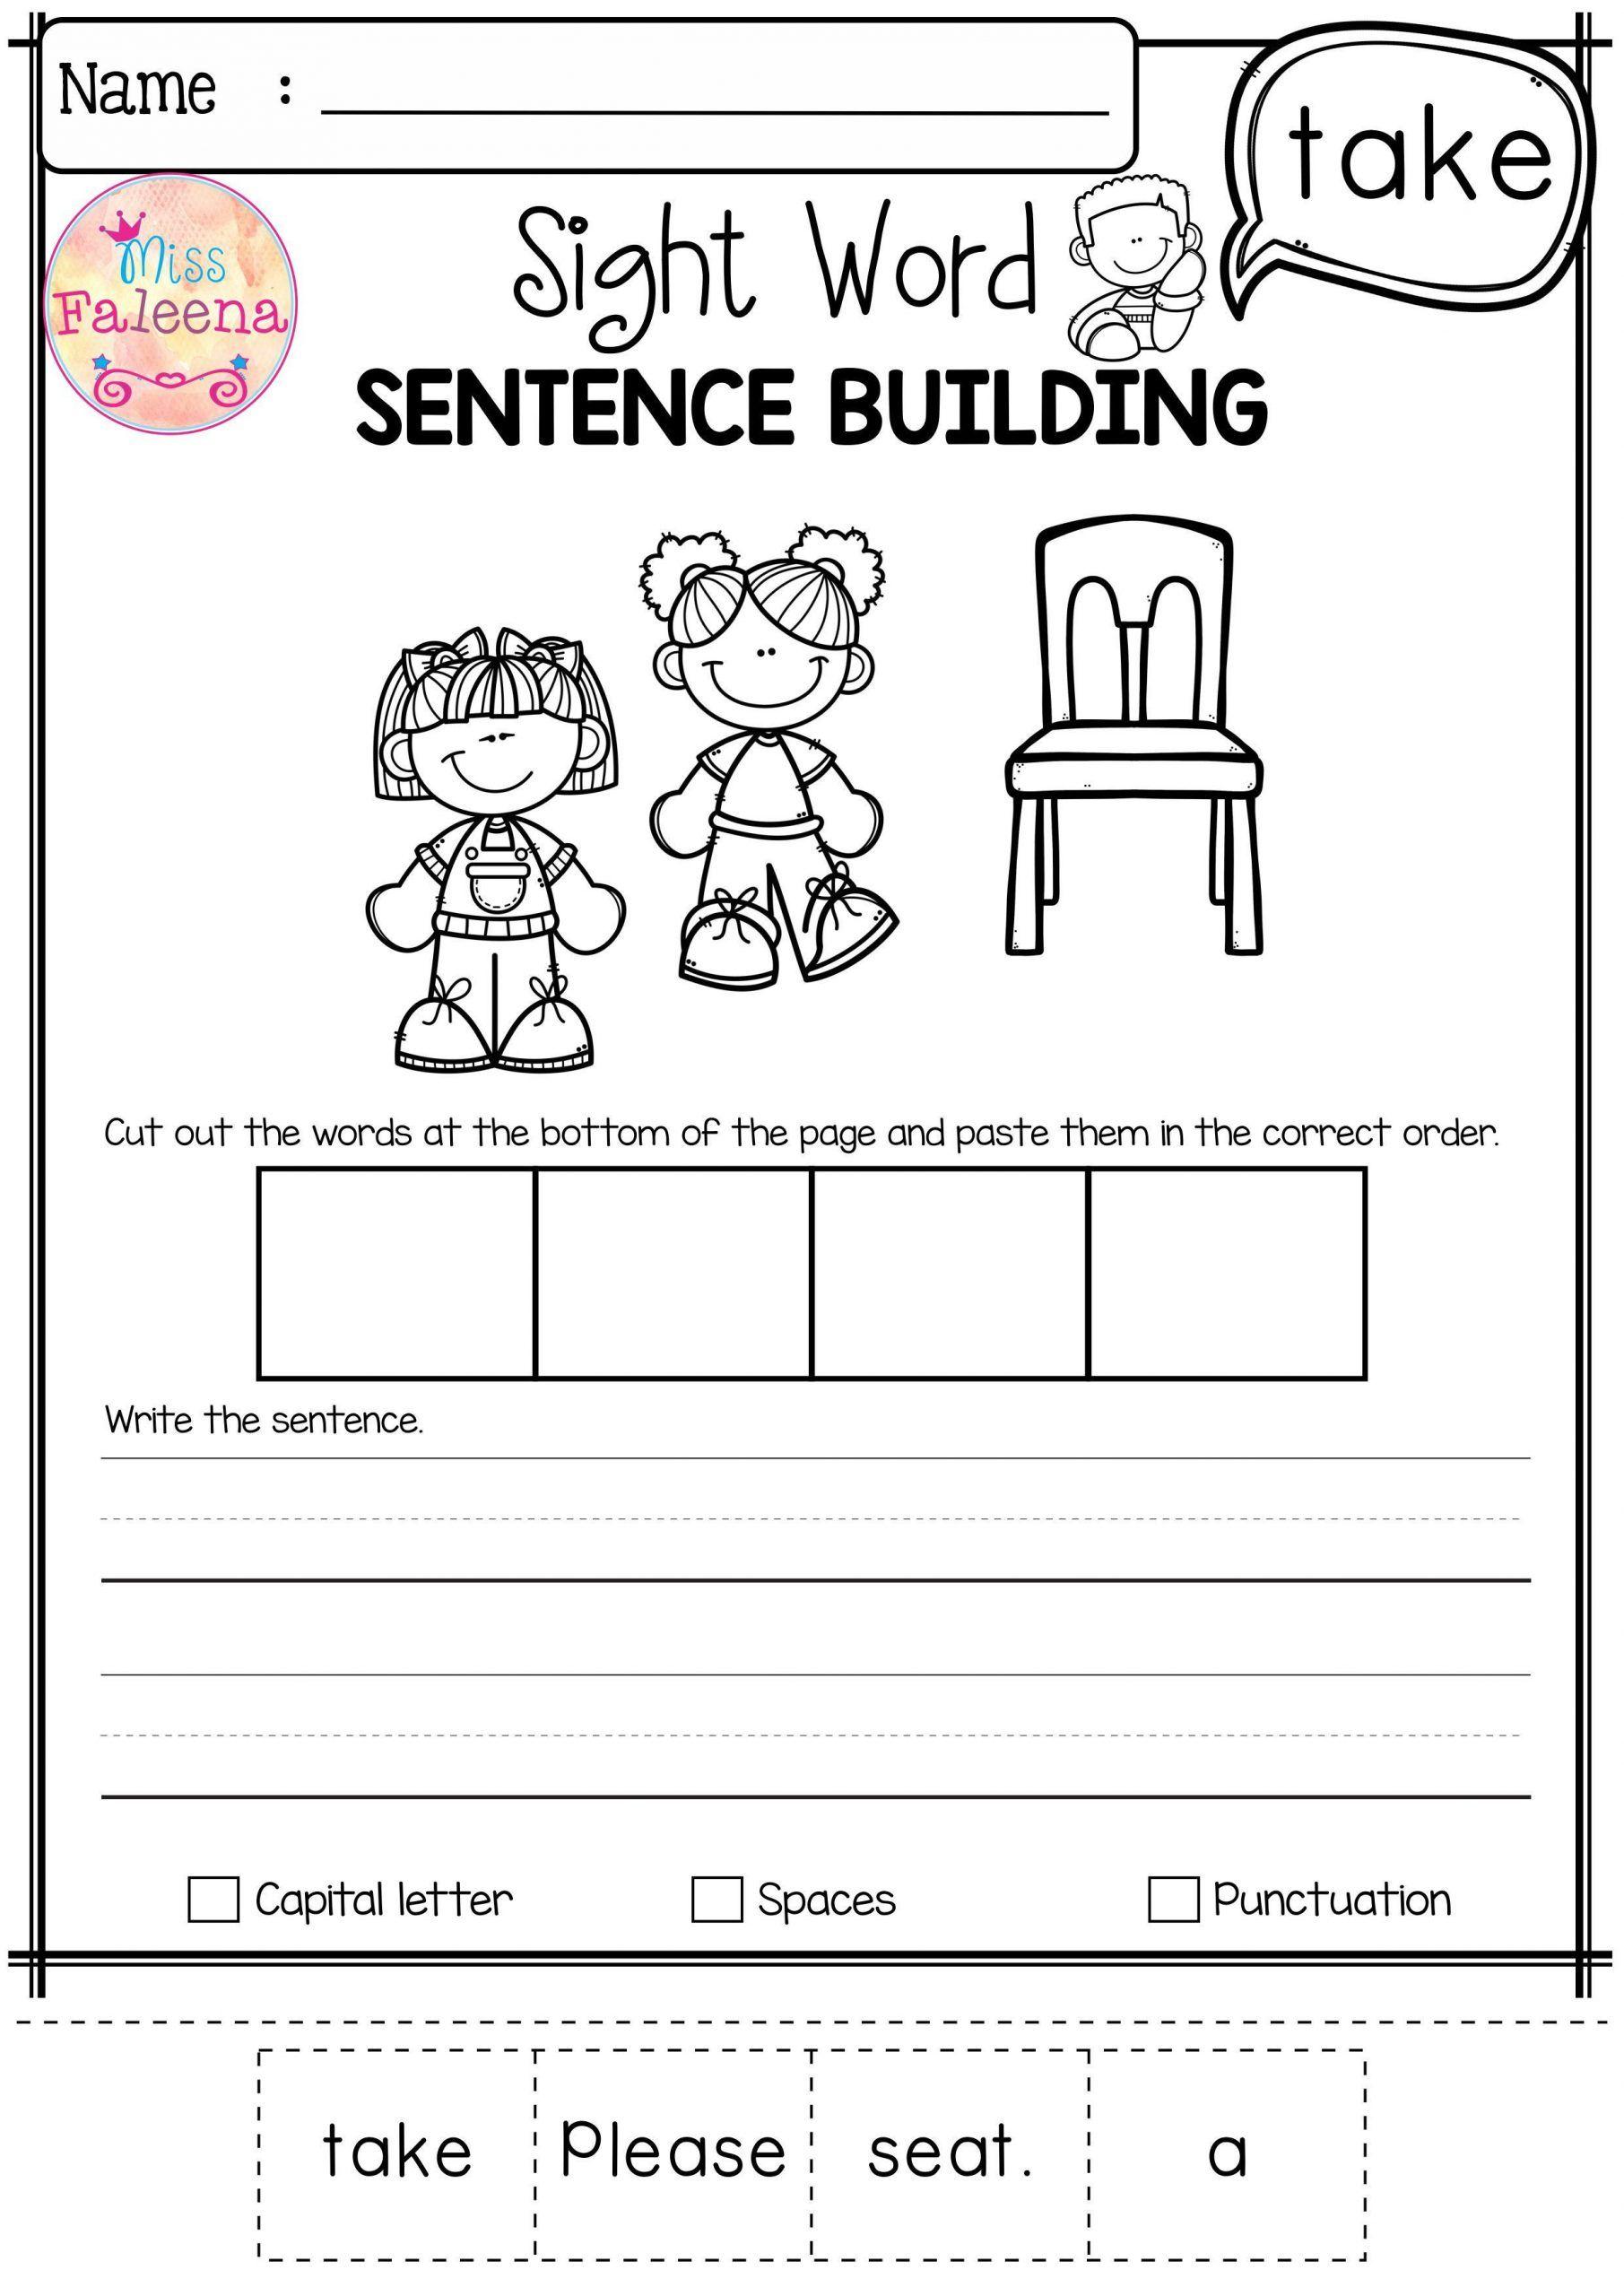 Sentence Building Worksheets For Kindergarten In